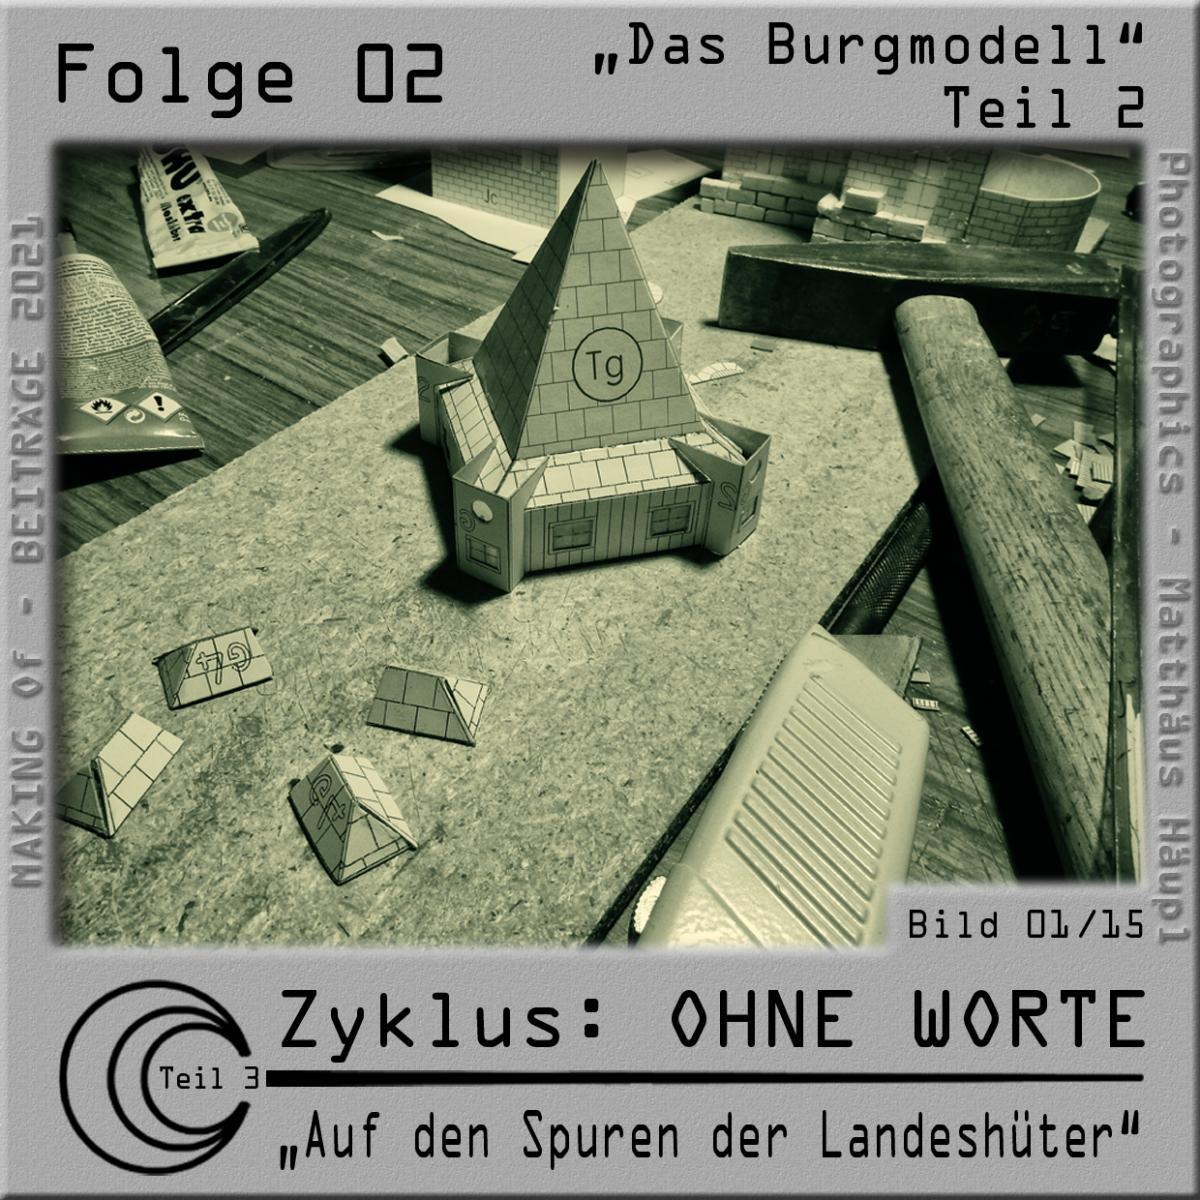 Folge-02 Das-Burgmodell Teil-2-01